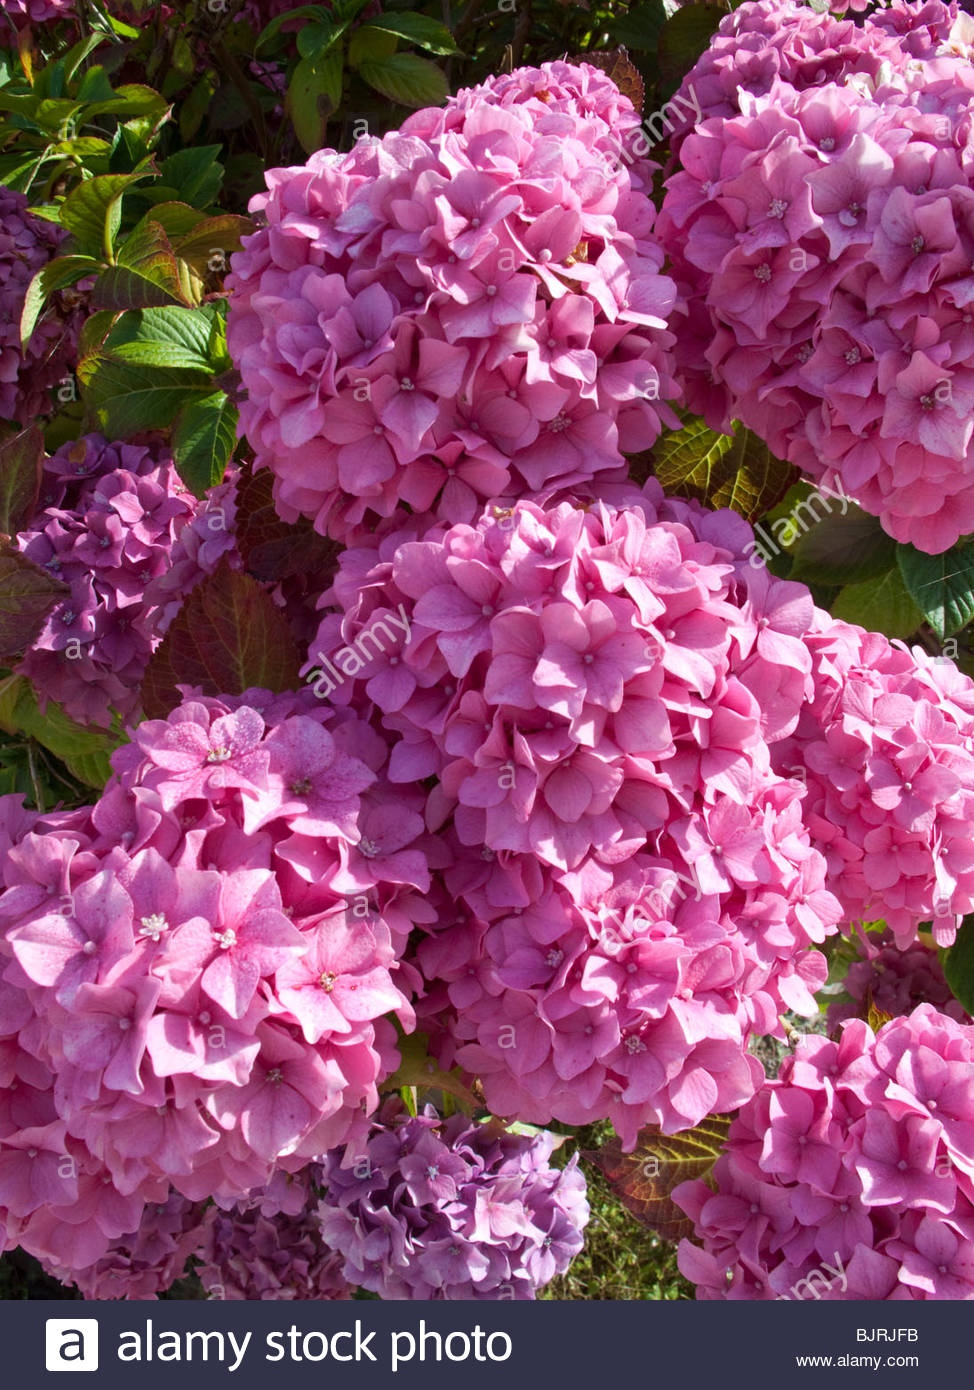 Big pink hydrangea flowers stock photo 28793615 alamy big pink hydrangea flowers mightylinksfo